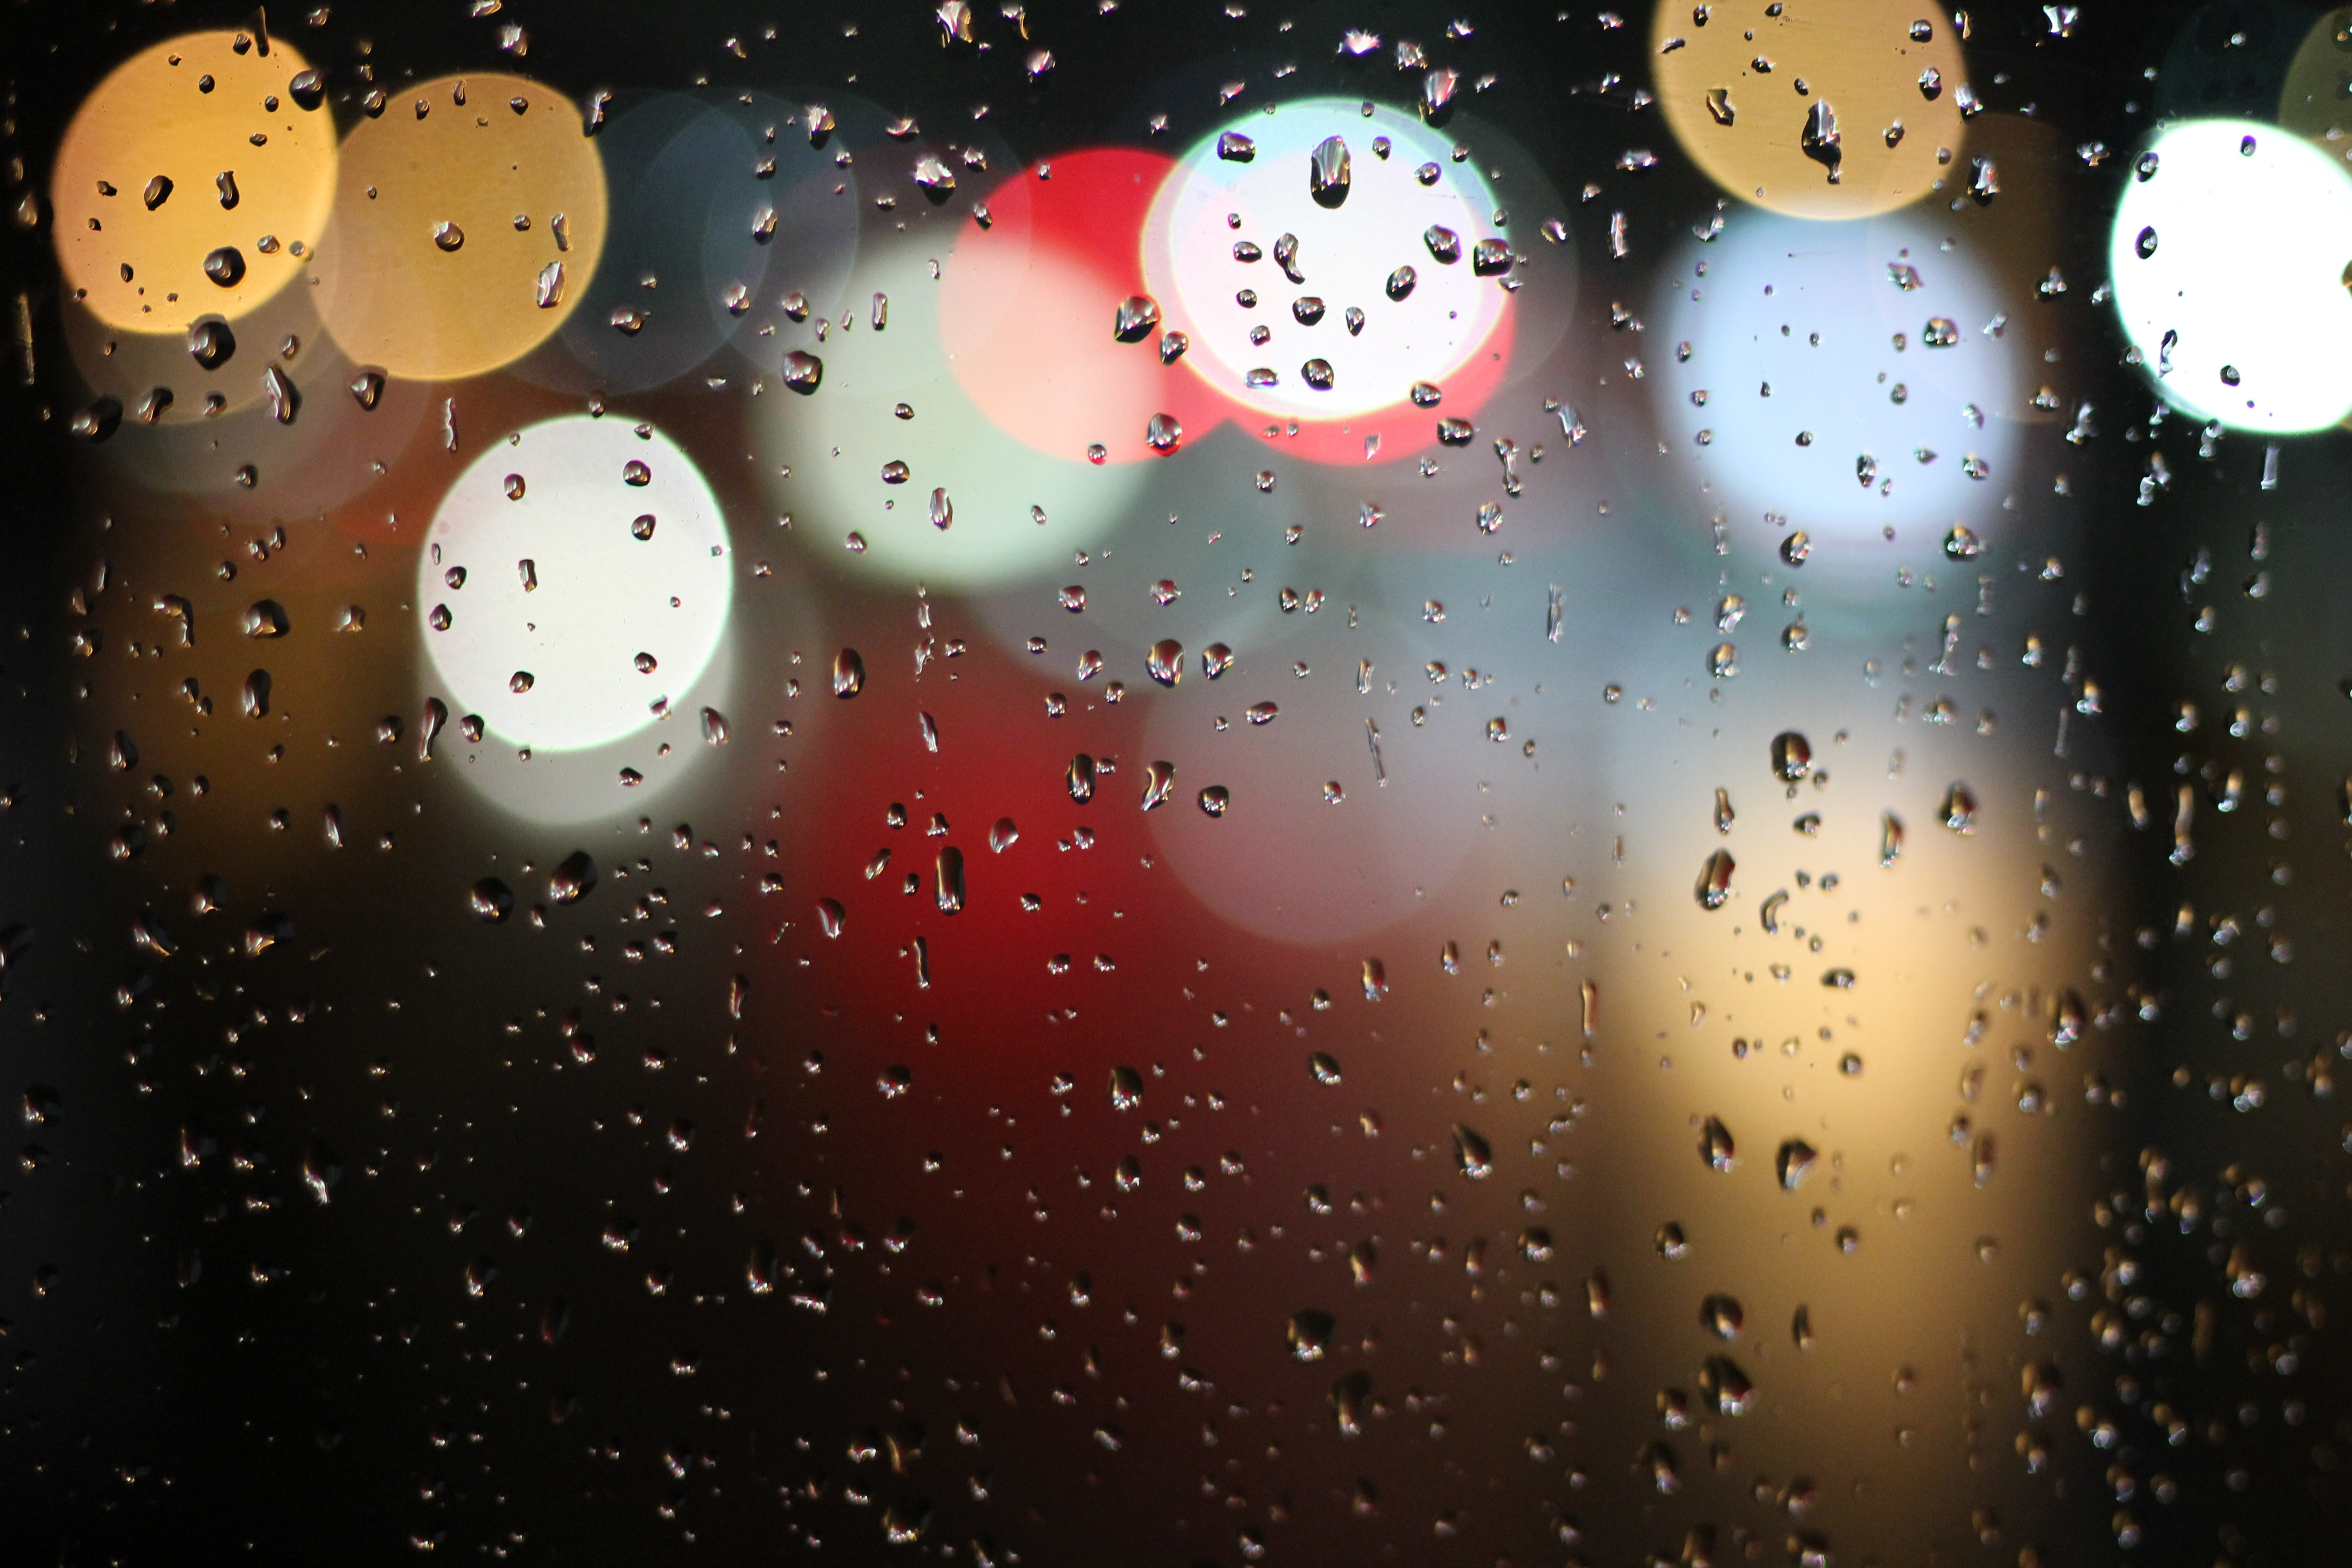 Background mưa buồn cực chất